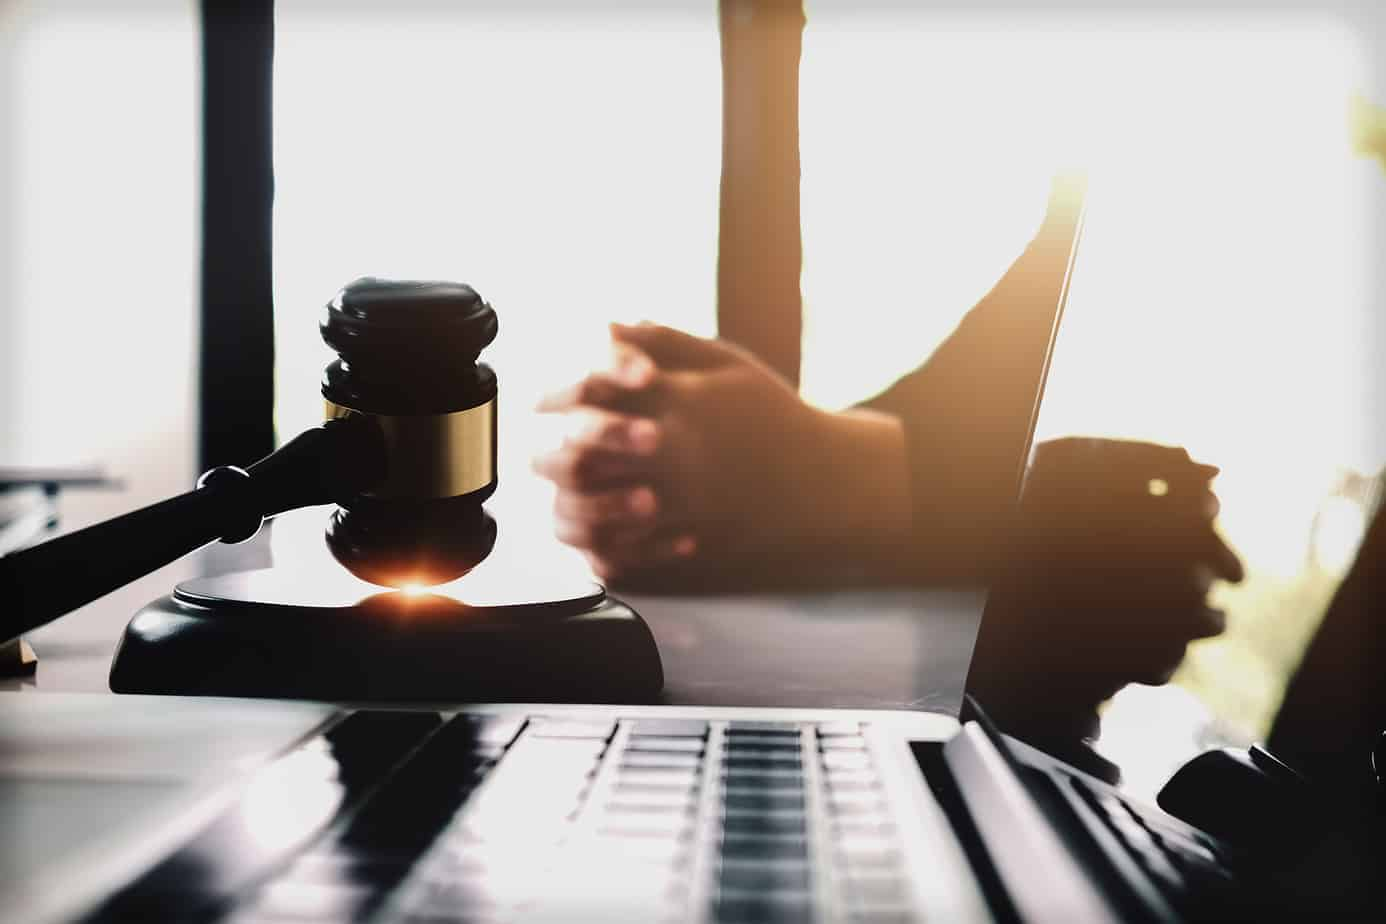 Pre-Trial Proceedings Streamlined in Bard Davol MDL • Legal